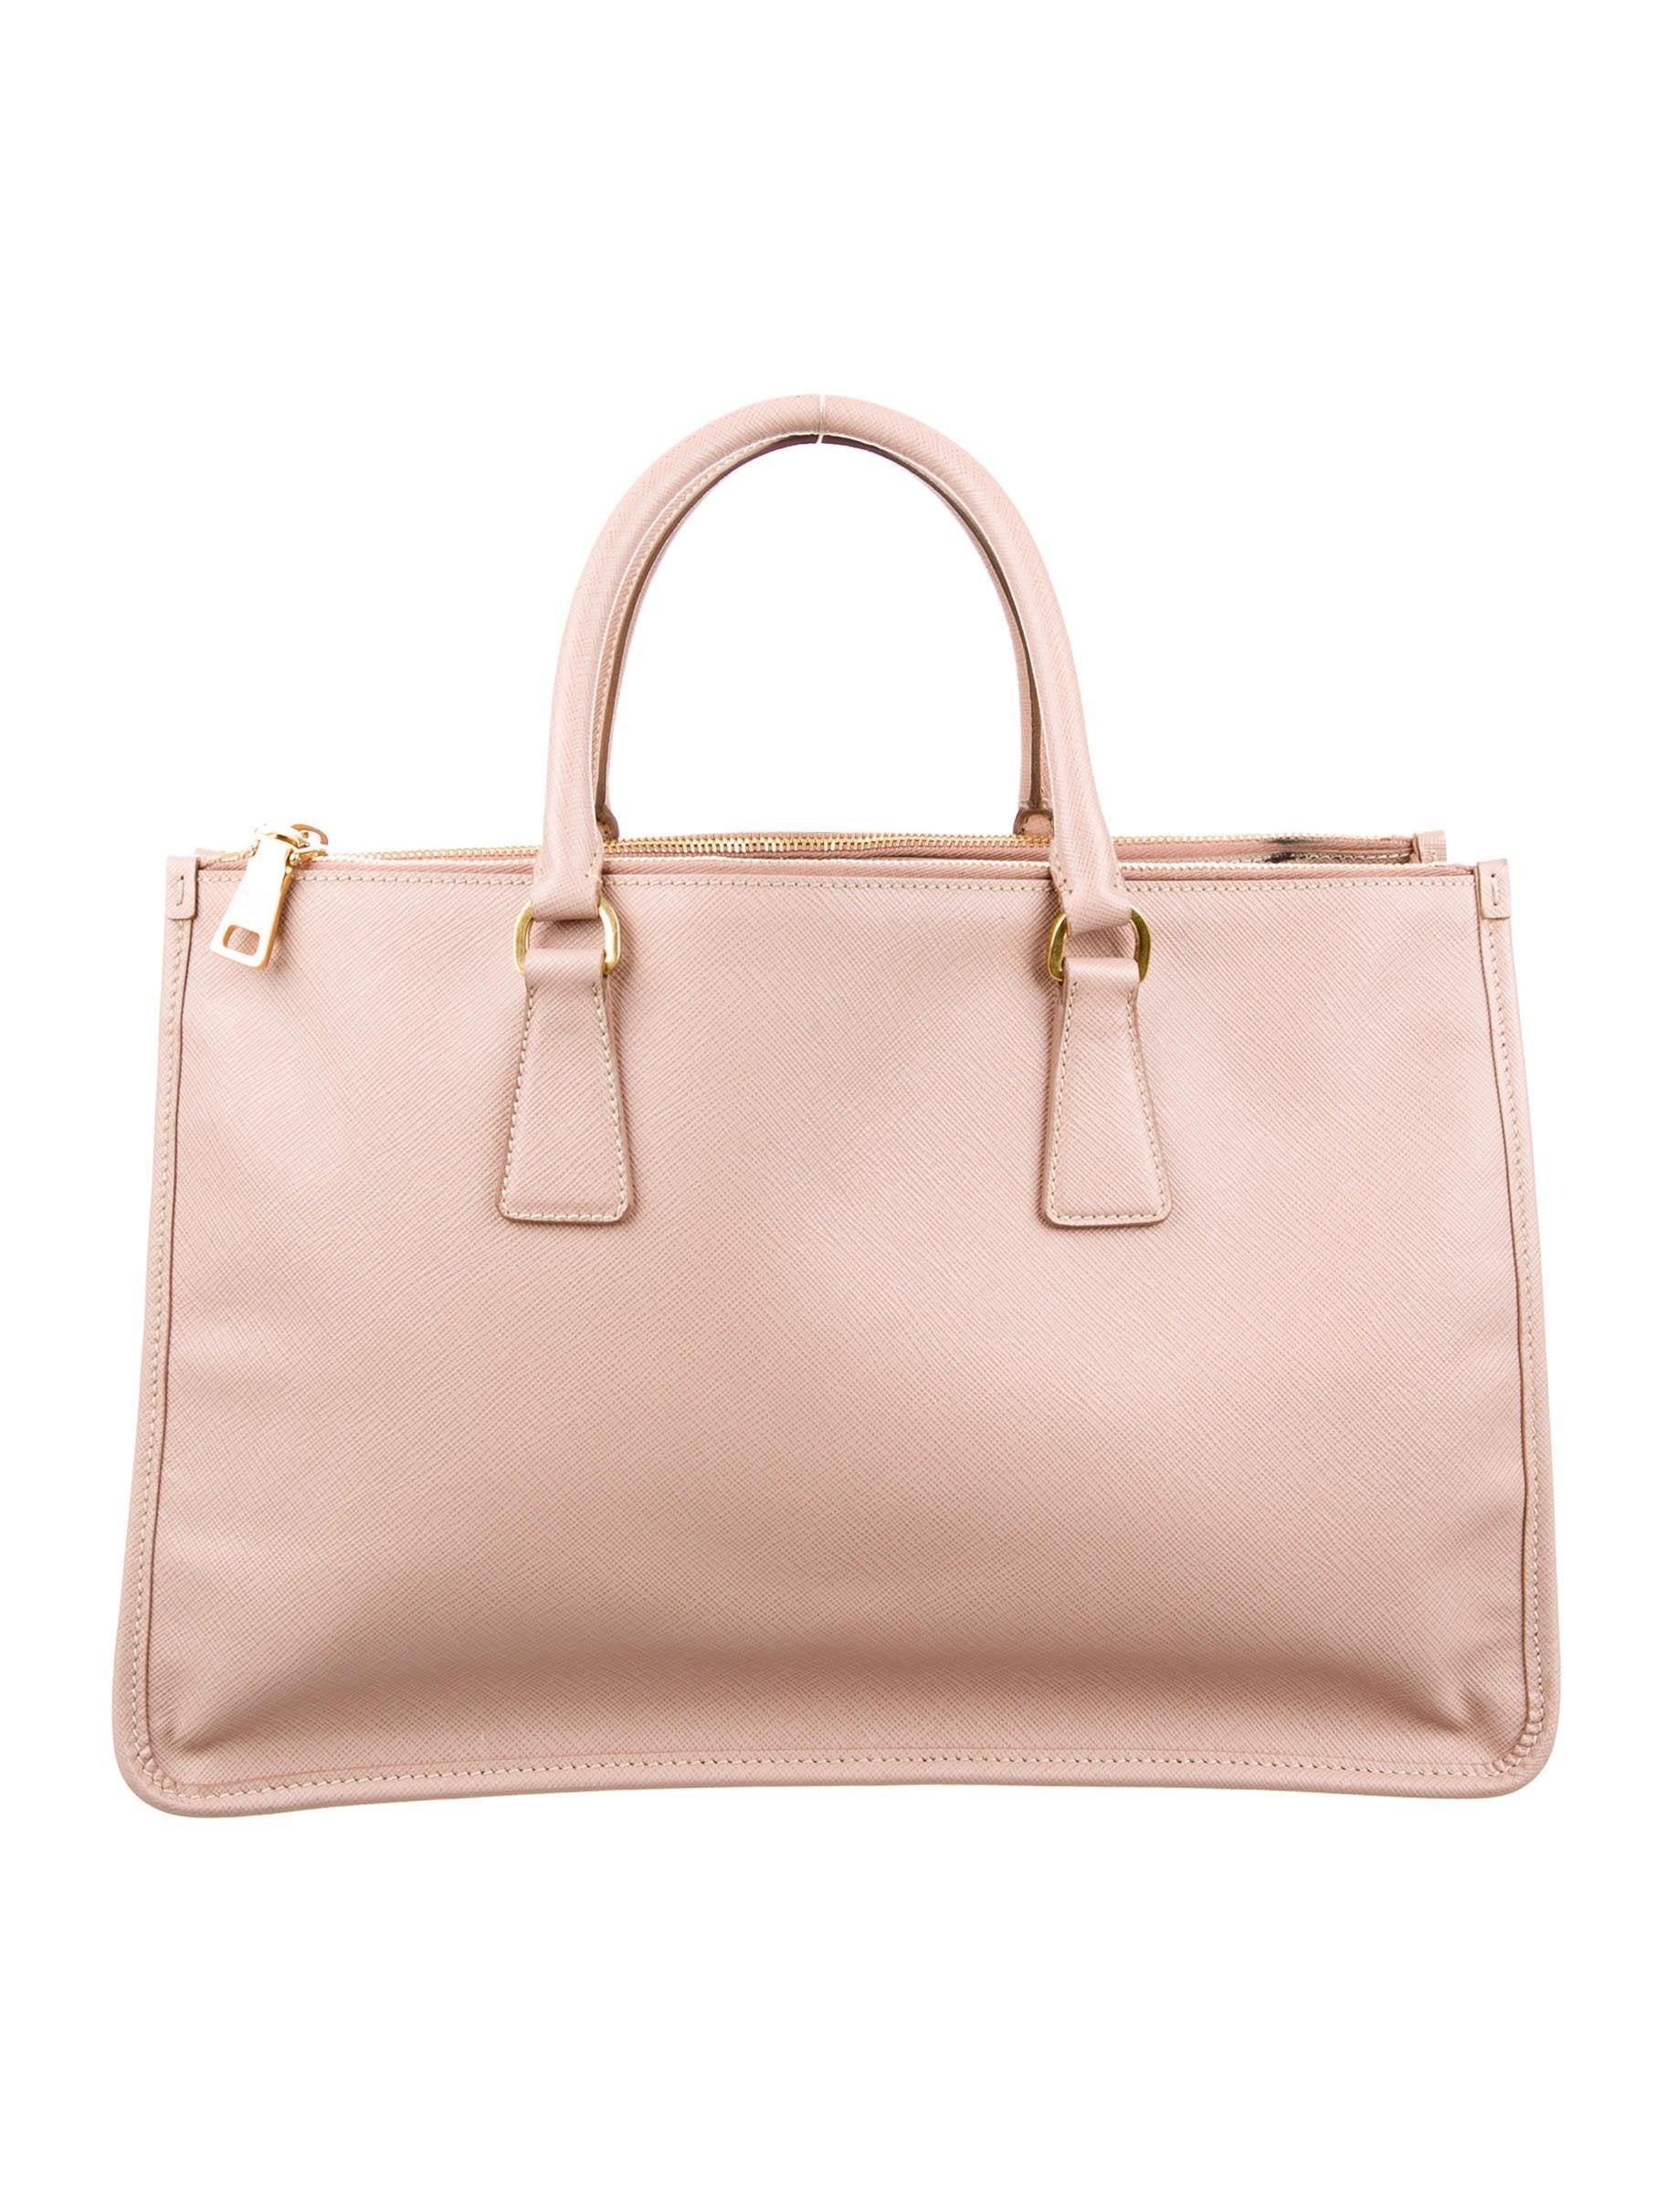 bc9762ce91eb Prada Saffiano Lux Double Zip Frame Tote - Handbags - PRA160589 | The  RealReal